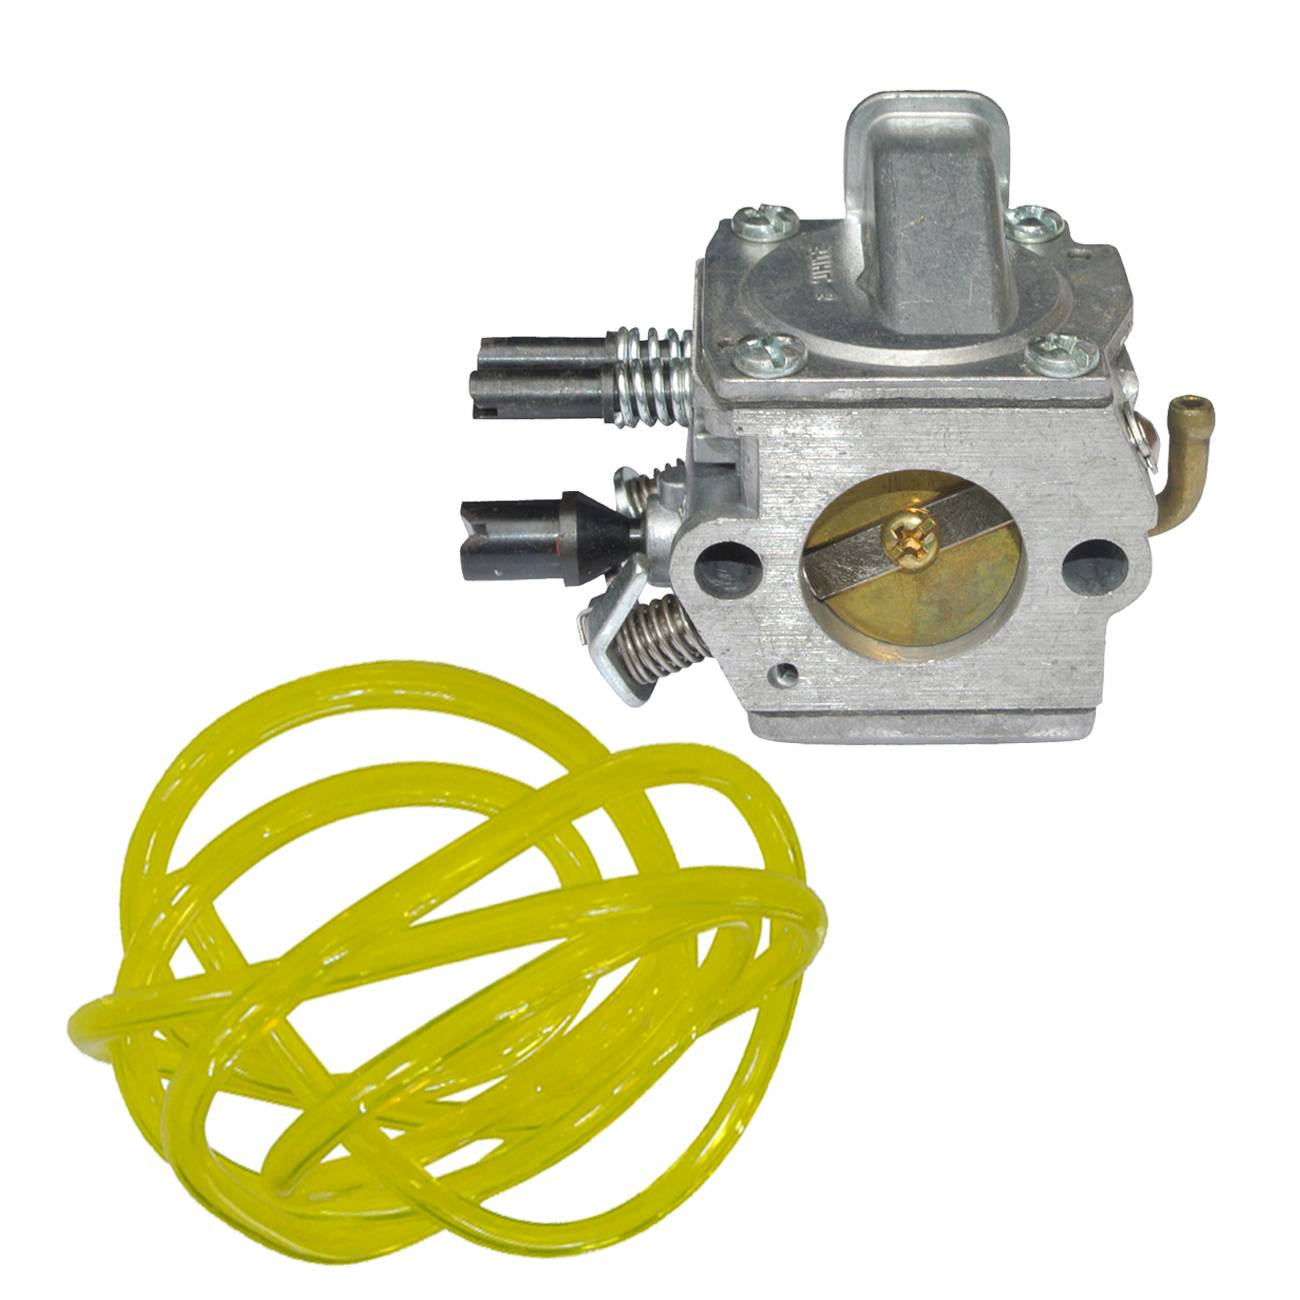 Benzinschlauch für Stihl 034 AV 034AV MS340 MS 340